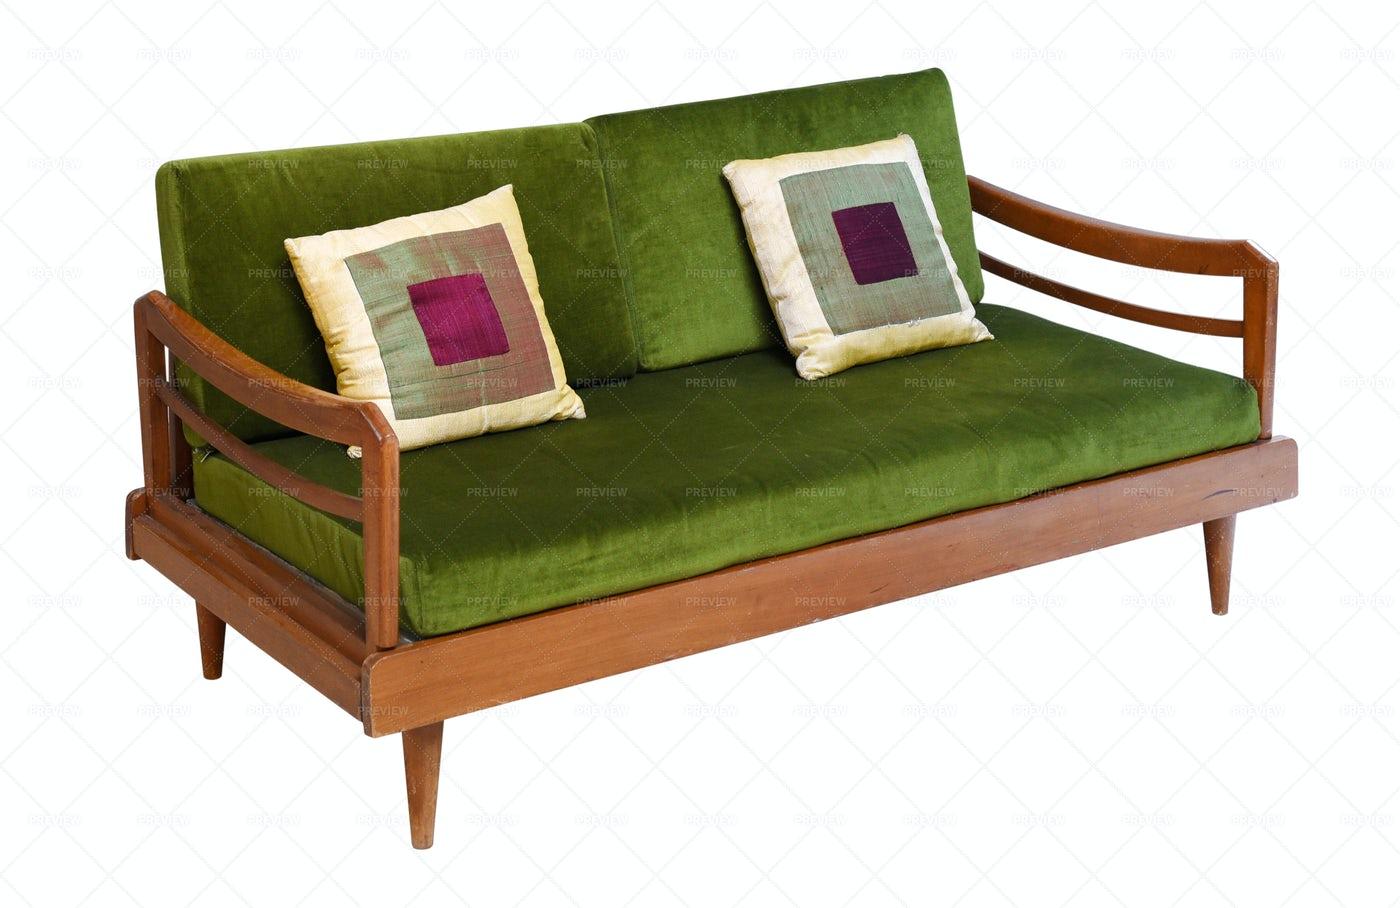 Green Velvet Sofa: Stock Photos